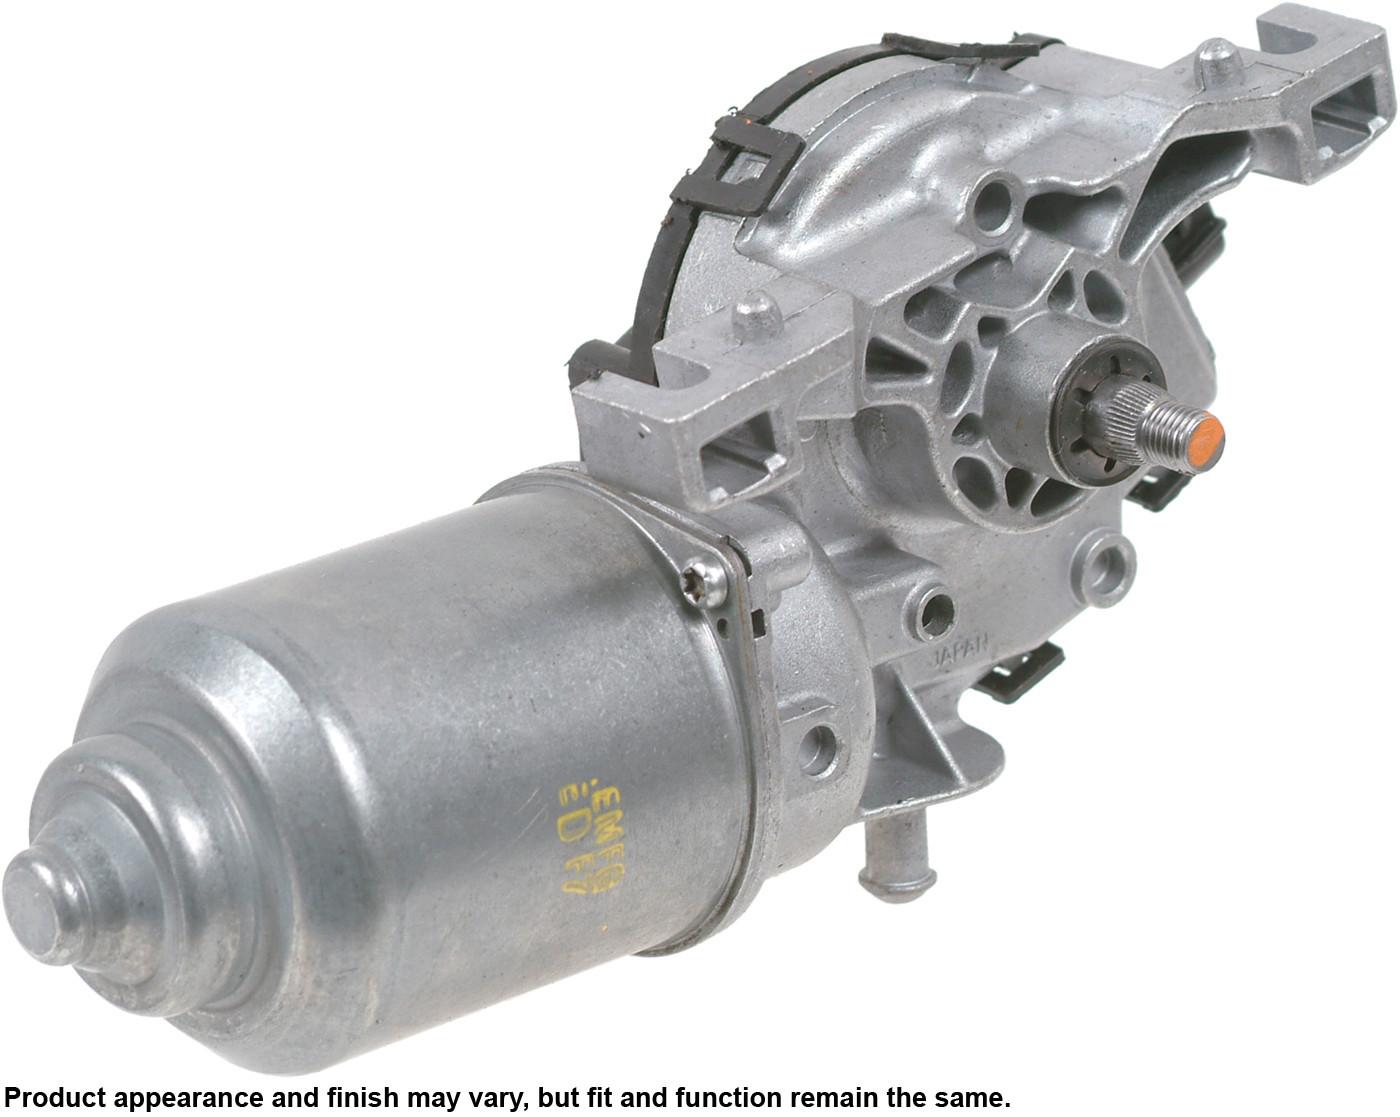 Imagen de Motor de Limpiaparabrisas para Hummer H3 2006 2007 Marca CARDONE Remanufacturado Número de Parte 40-3033